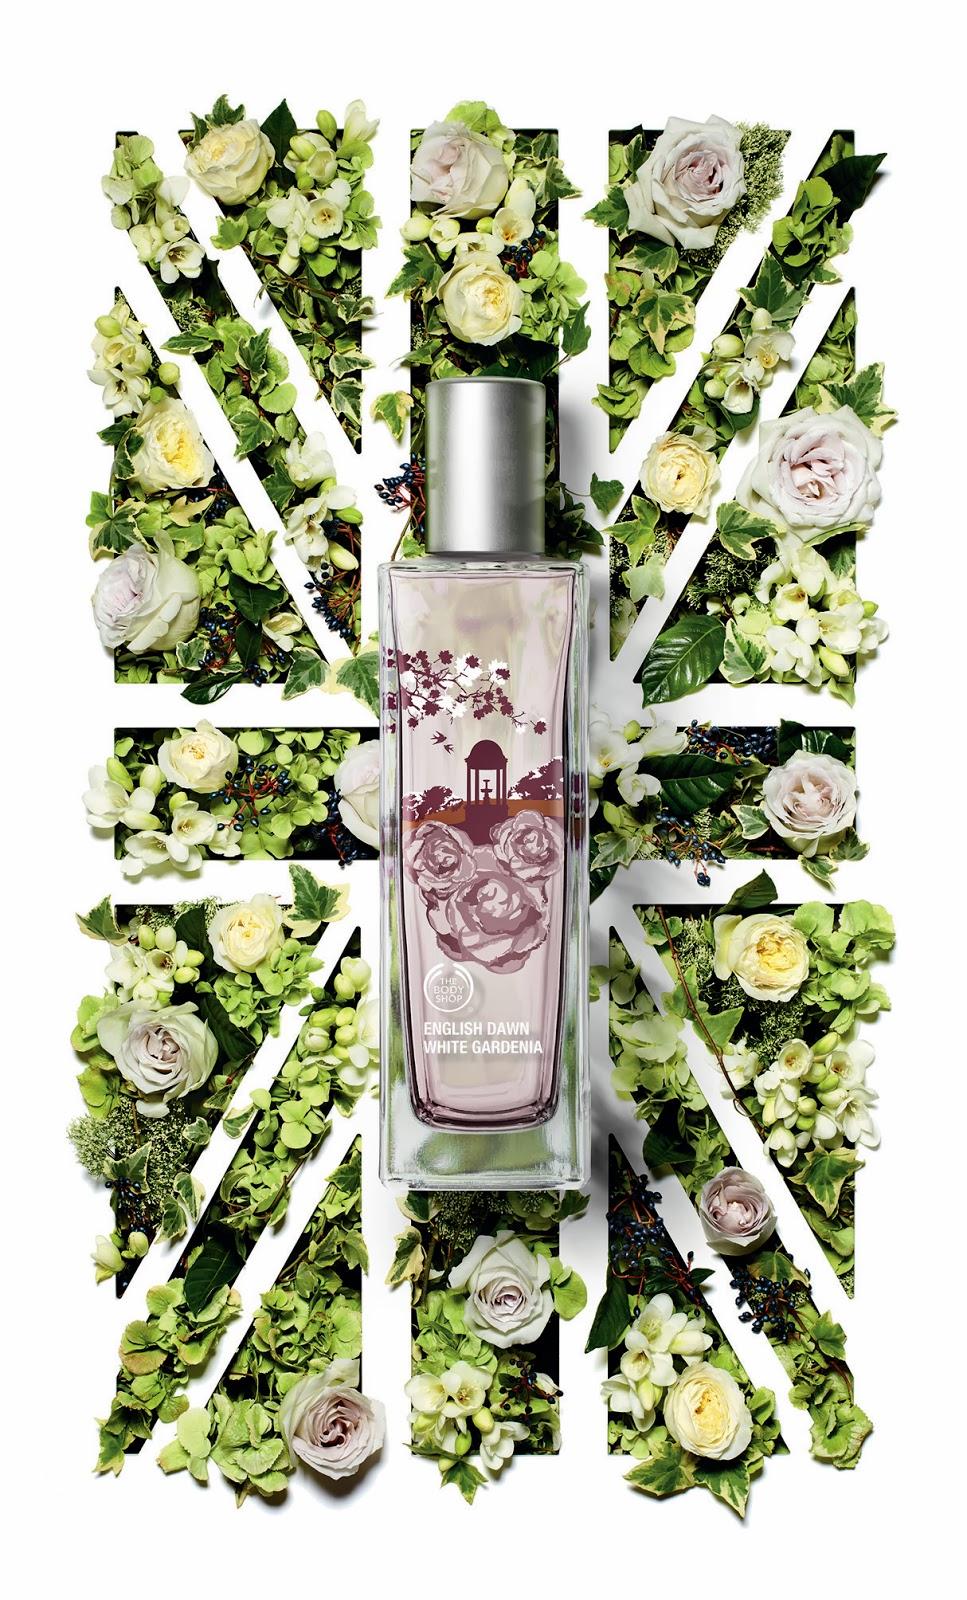 The elusive gardenia the body shop english dawn white gardenia english dawn white gardenia dhlflorist Images